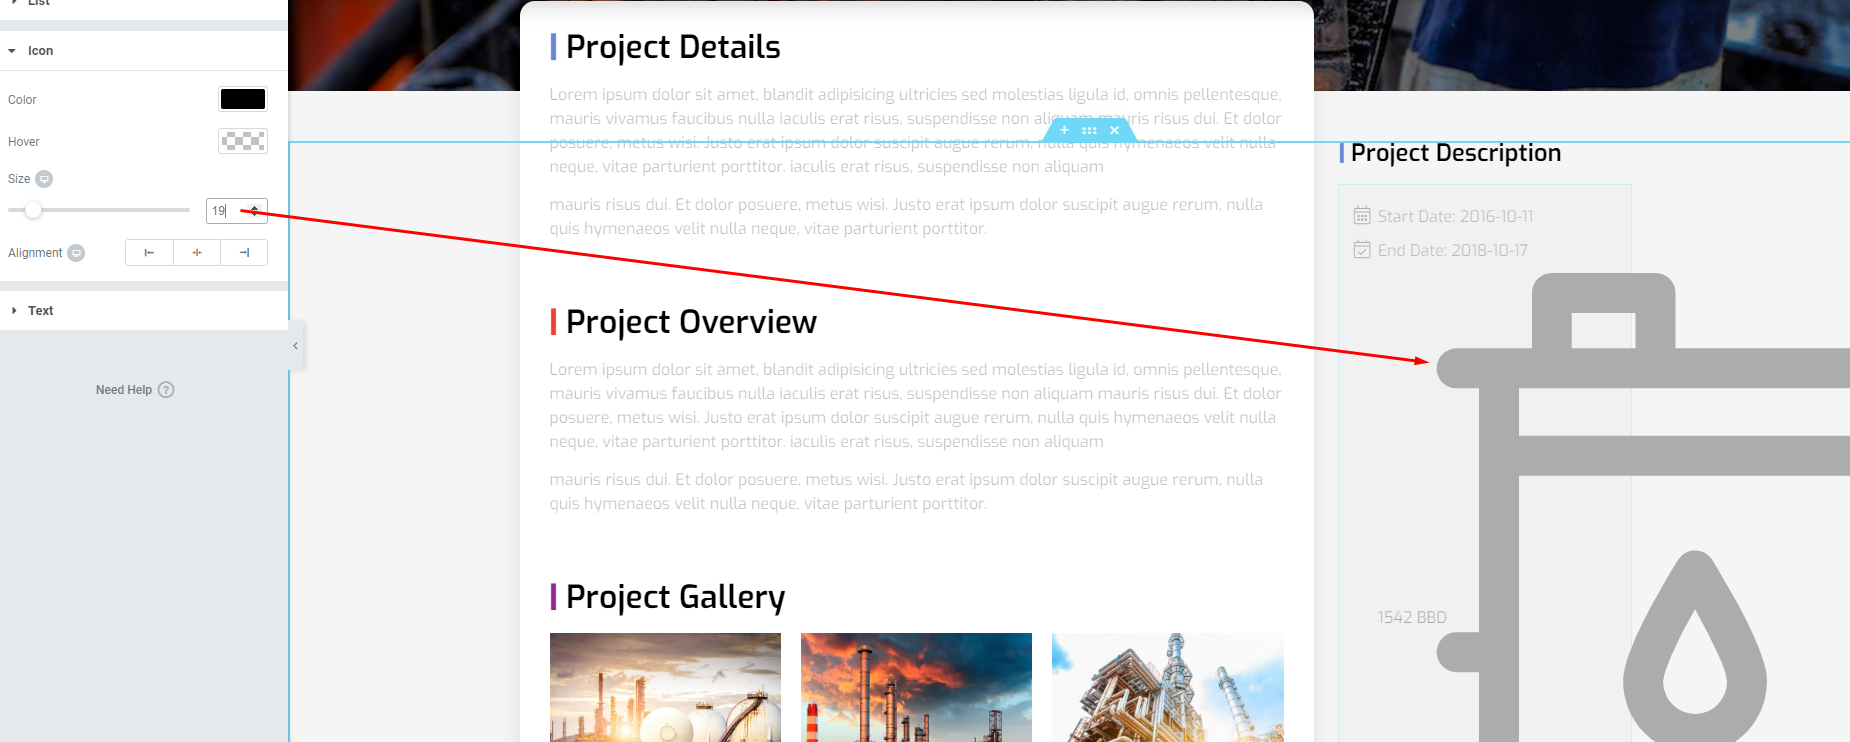 Elementor Pro 2 6 0 (Beta 4 Release) · Issue #8506